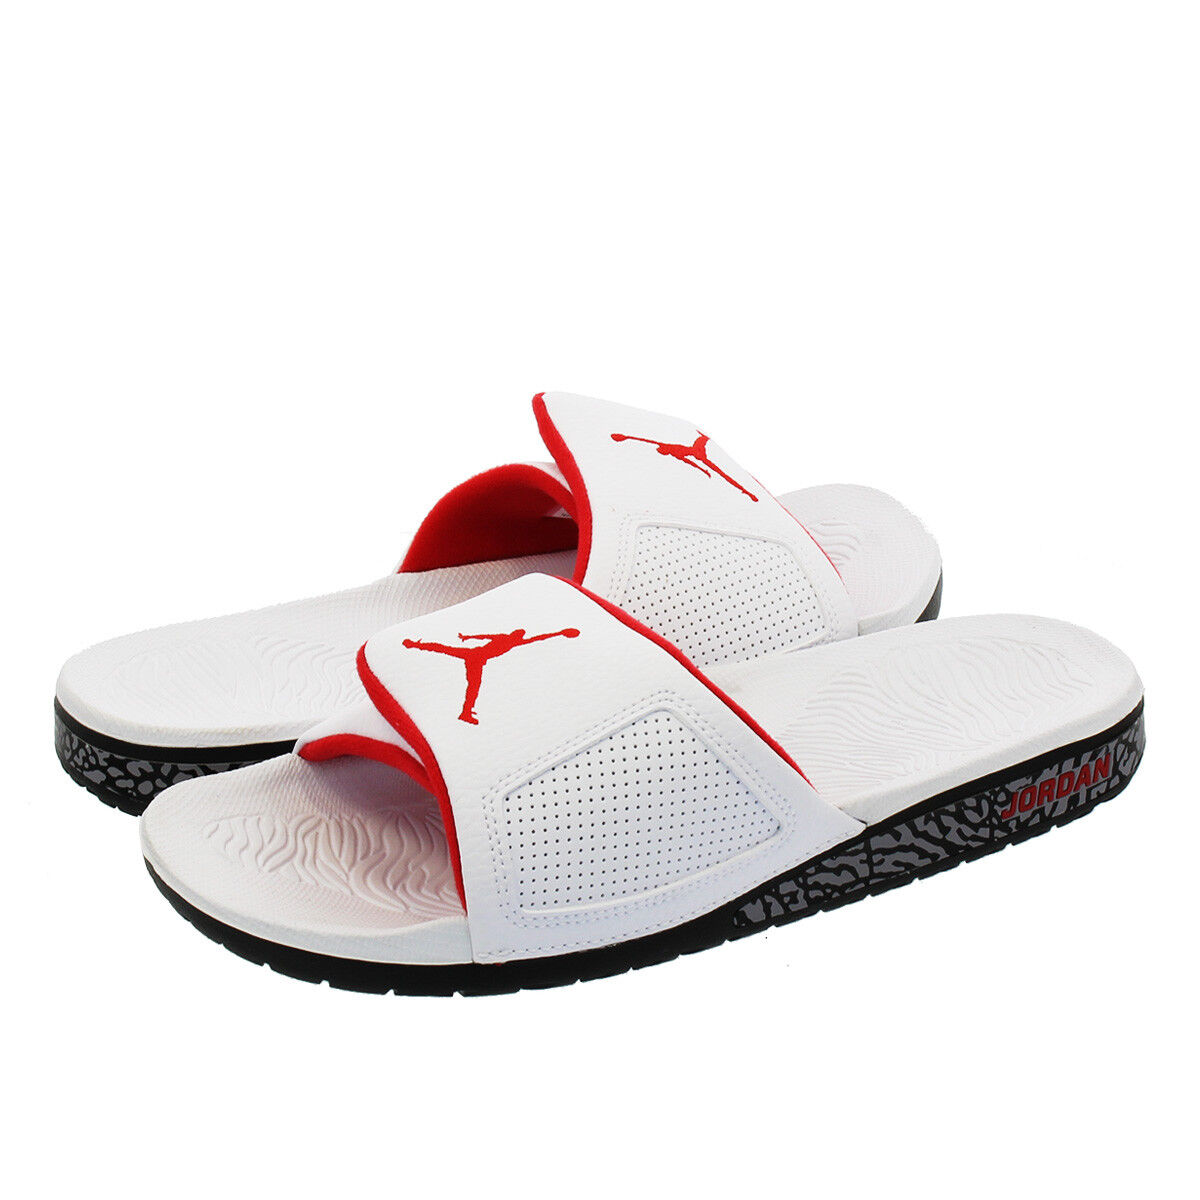 Nike Air Jordan Hydro III 3 Retro White Red Black Slides SZ 10 ( 854556-103 )